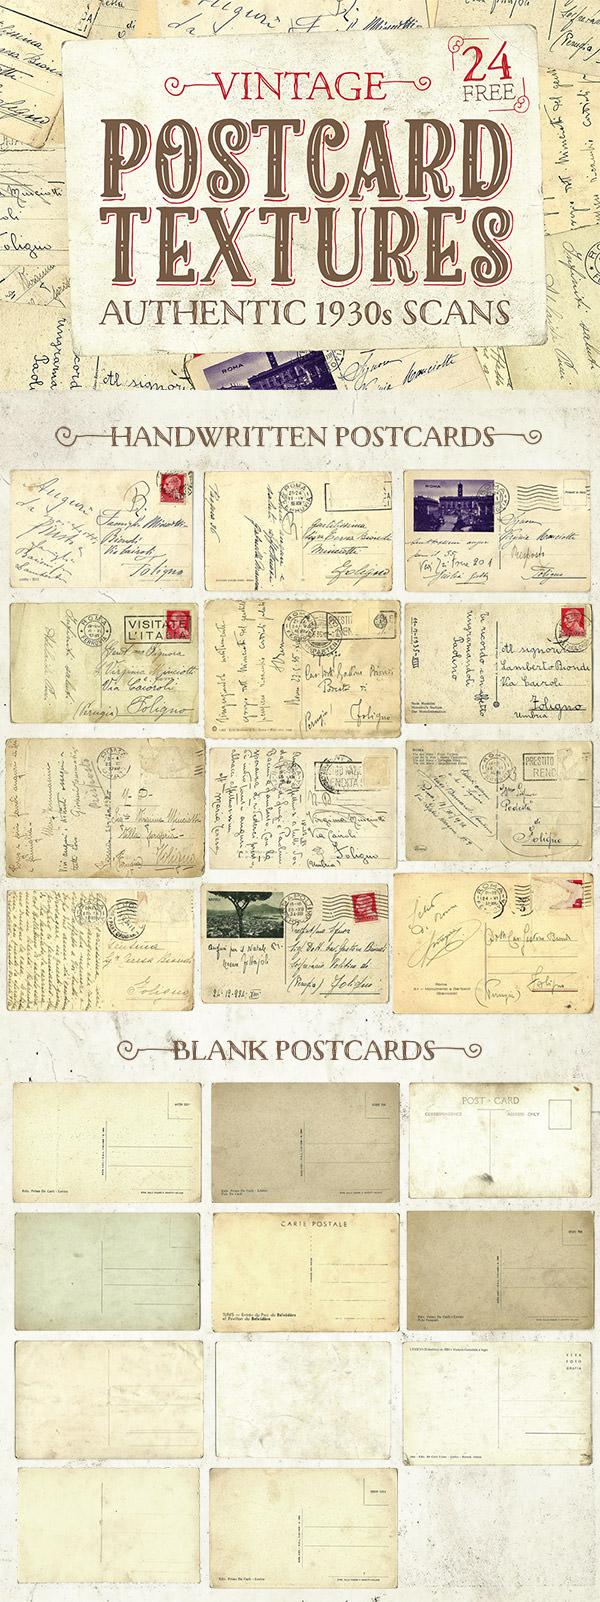 24 Free Authentic 1930s Vintage Postcard Textures